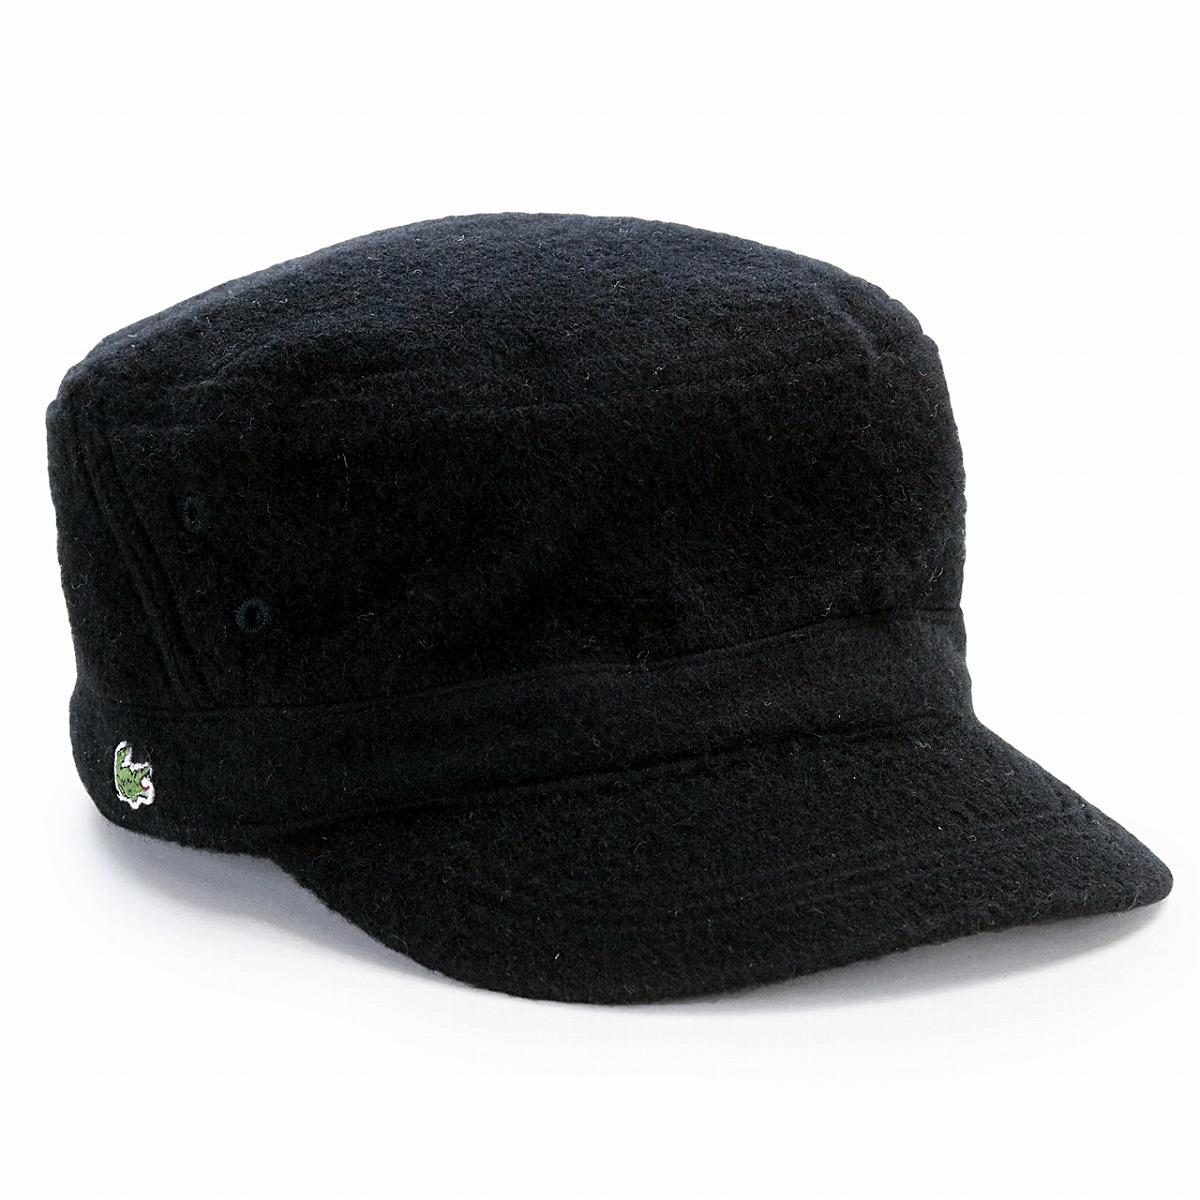 Cap 56.5cm 58cm 59.5cm   black black  cadet cap  gift present made in  Lacoste work cap men lacoste cap Lady s LACOSTE hat embroidery wool de  Gaulle cap ... f3a6f7326b3d